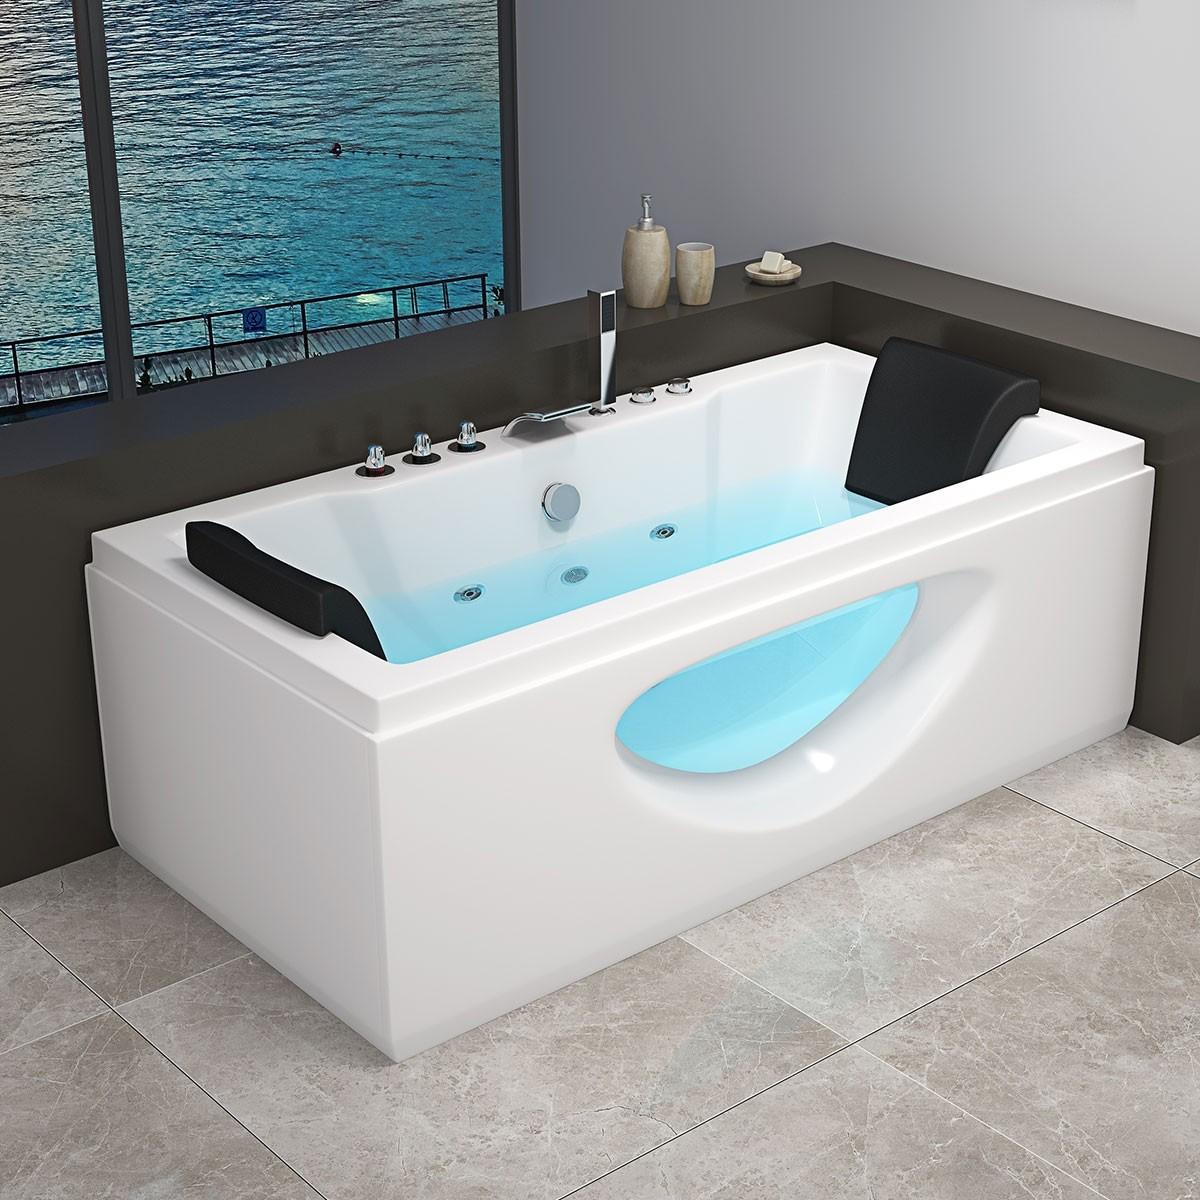 Decoraport 71 x 36 In Whirlpool Tub in Acrylic White (DK-RL-6132)